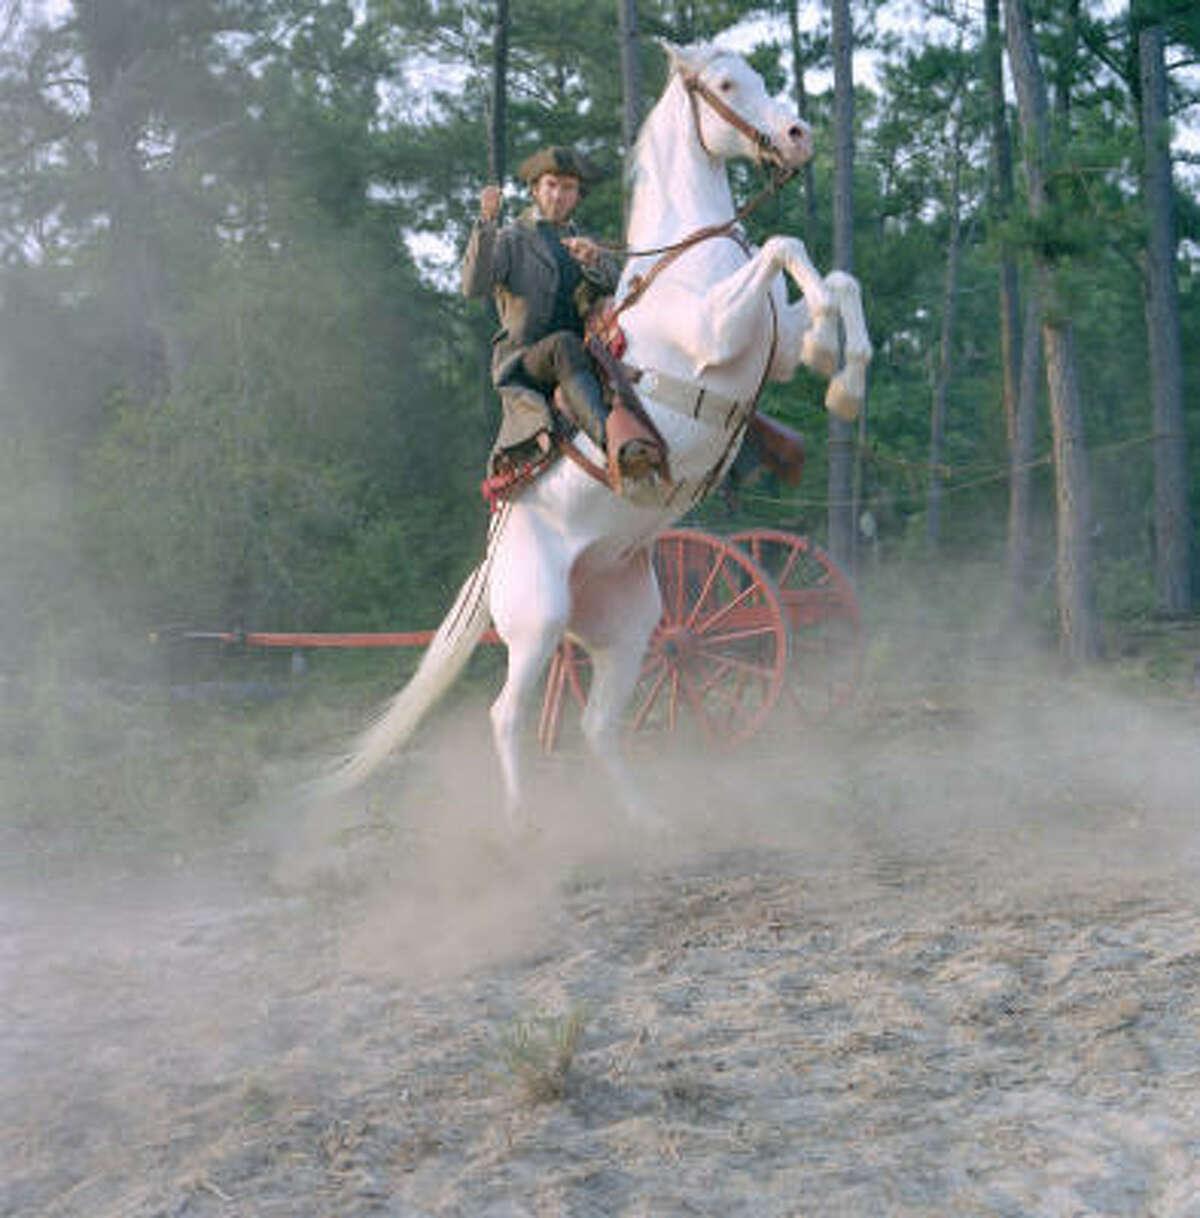 2004: Dennis Quaid in The Alamo. Film Location: Near Milton Reimers Ranch Park, Austin